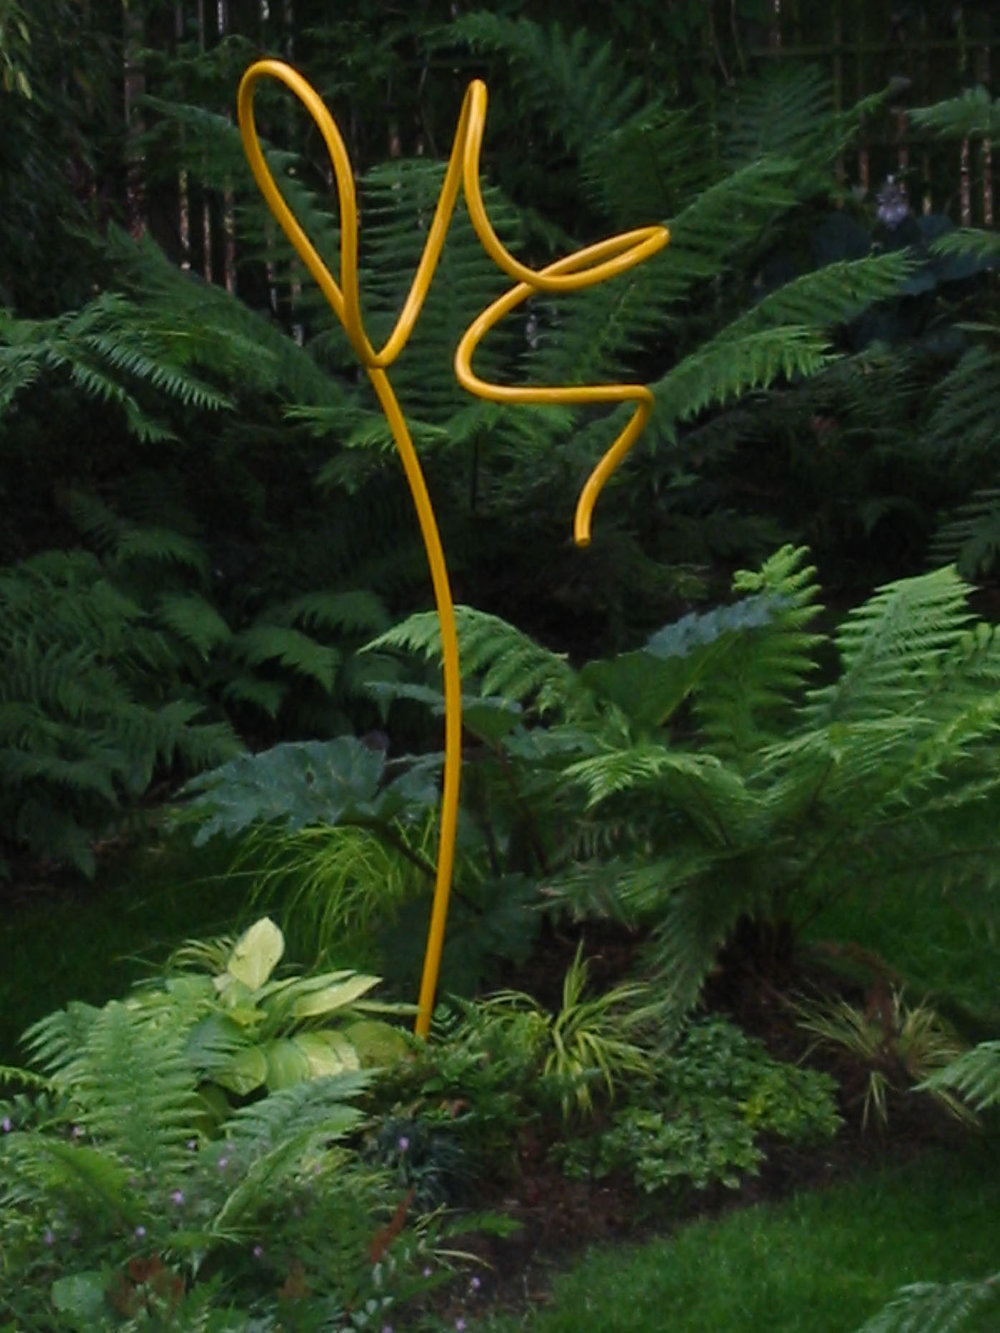 modfountain-sculptures-los-angeles21.jpg